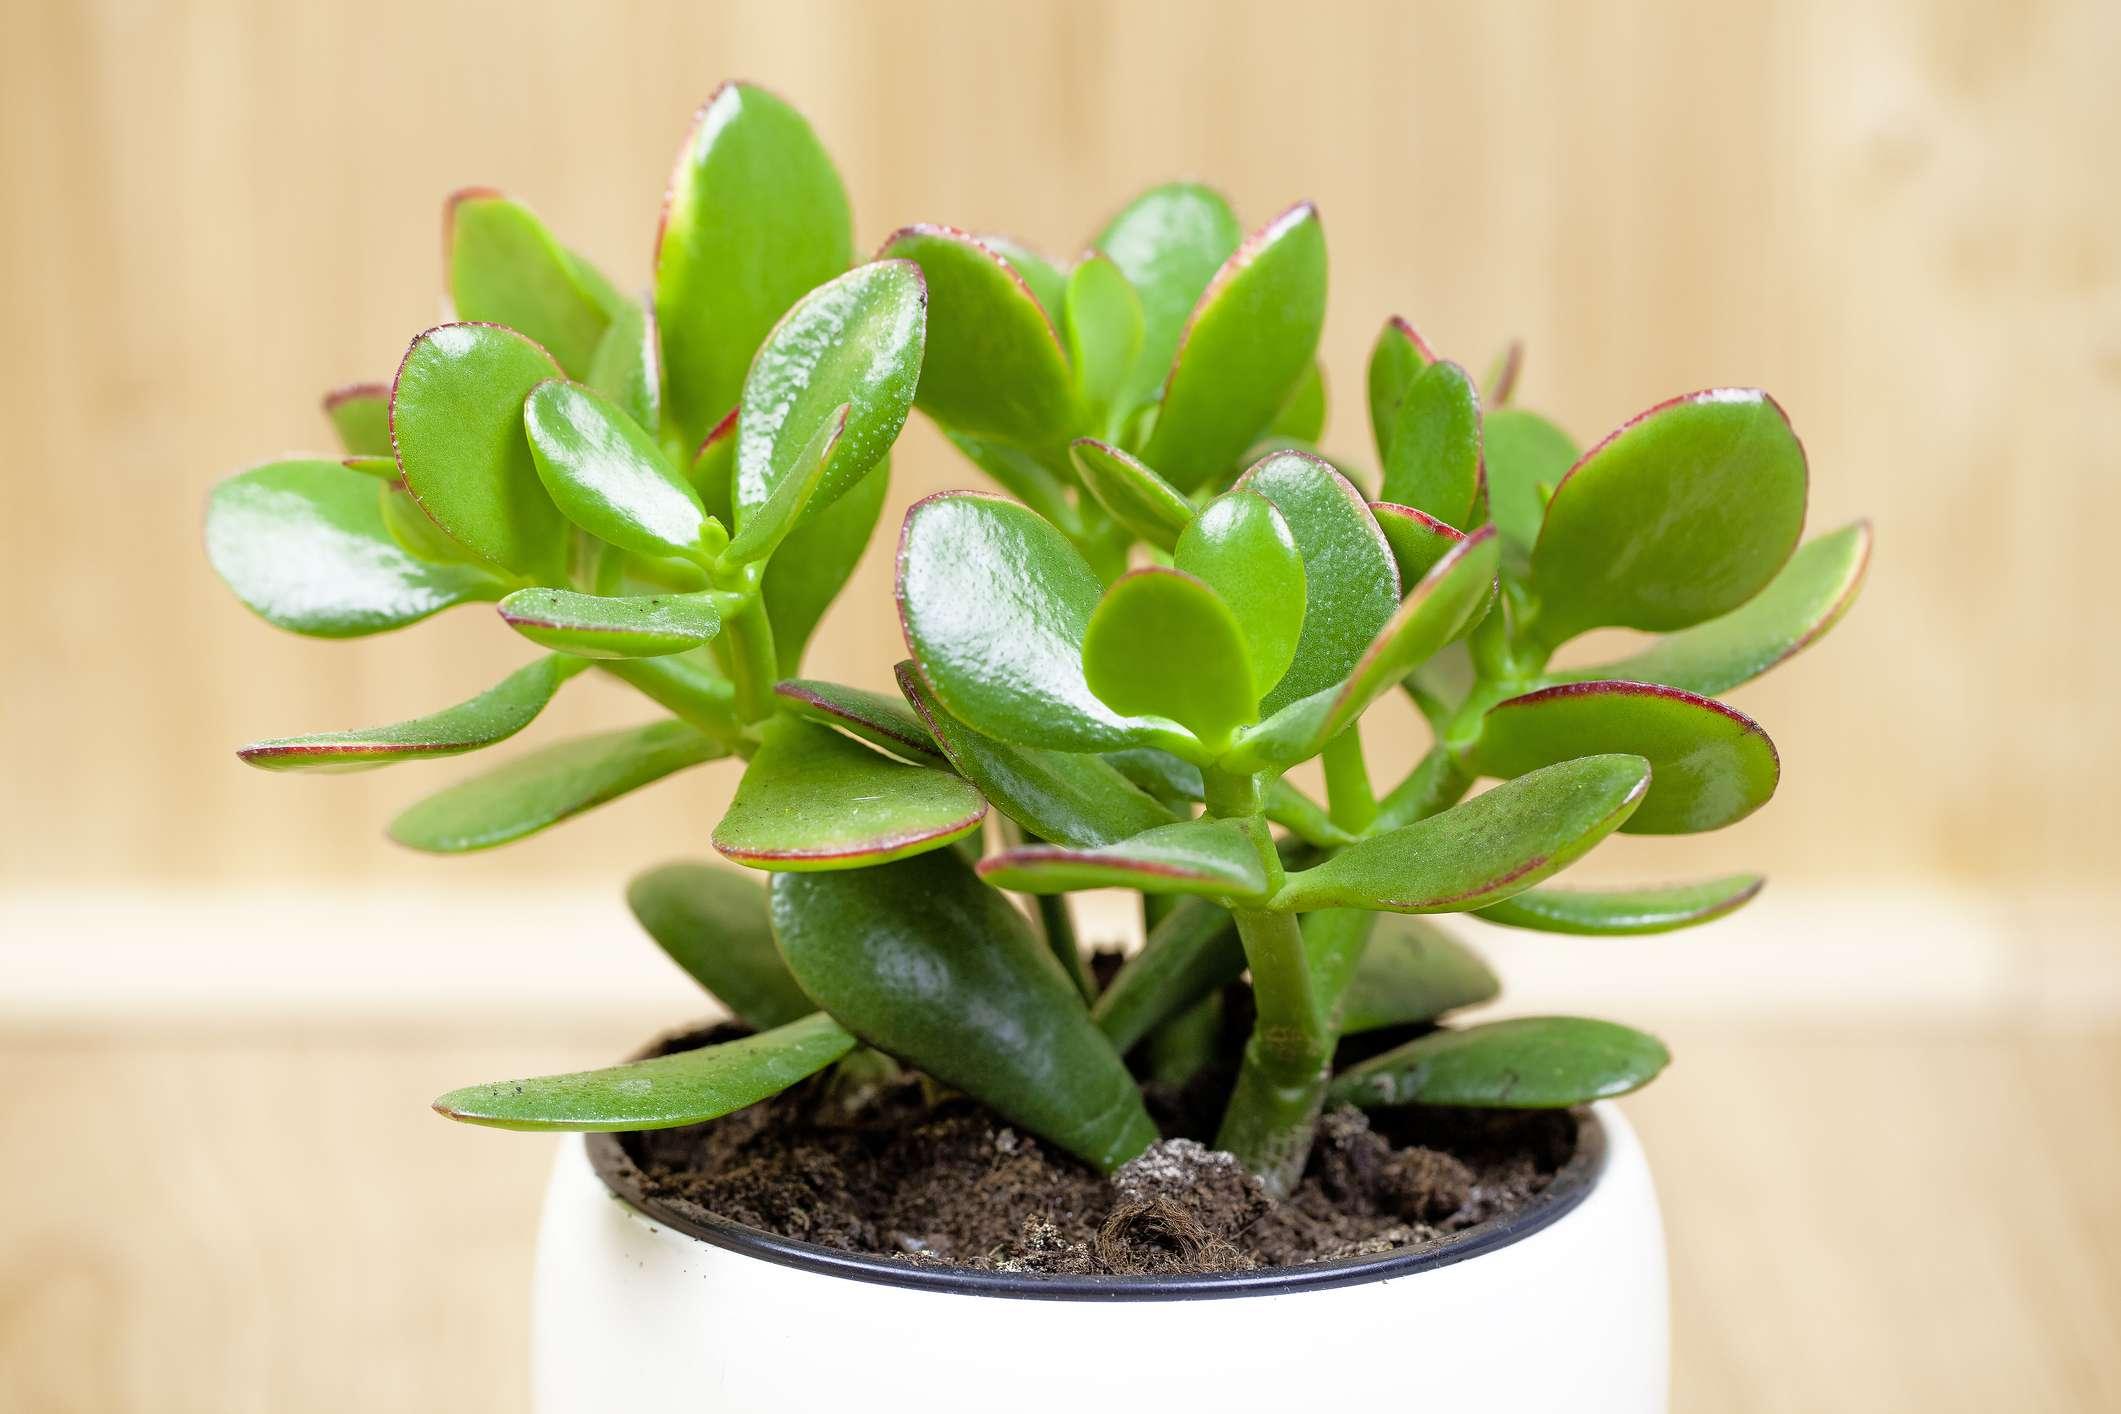 Jade plant, lucky plant, money plant or money tree, (Crassula ovata)